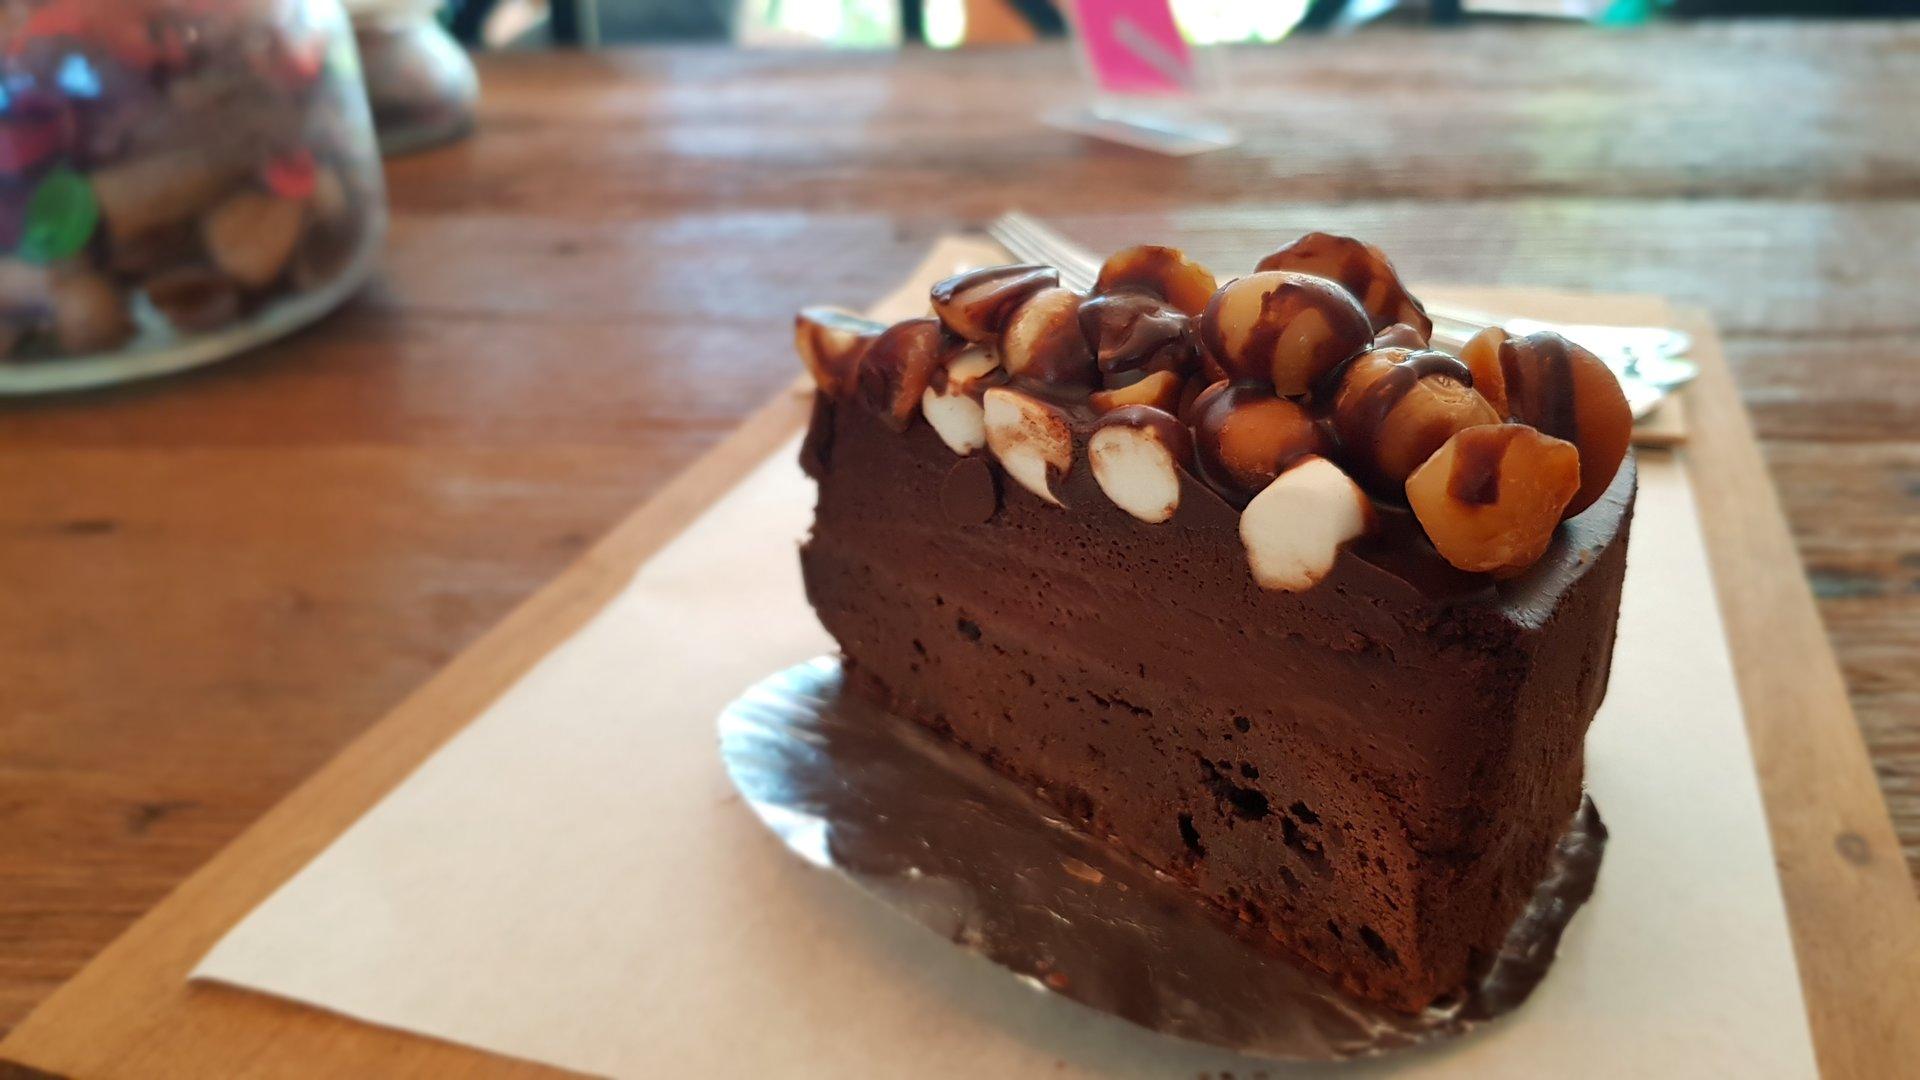 Macadamia Chocolate Cake @Buna Organic Coffee รสชาติเข้มข้น เมล็ดแม็คคาดาเมียกรุบกรอบ